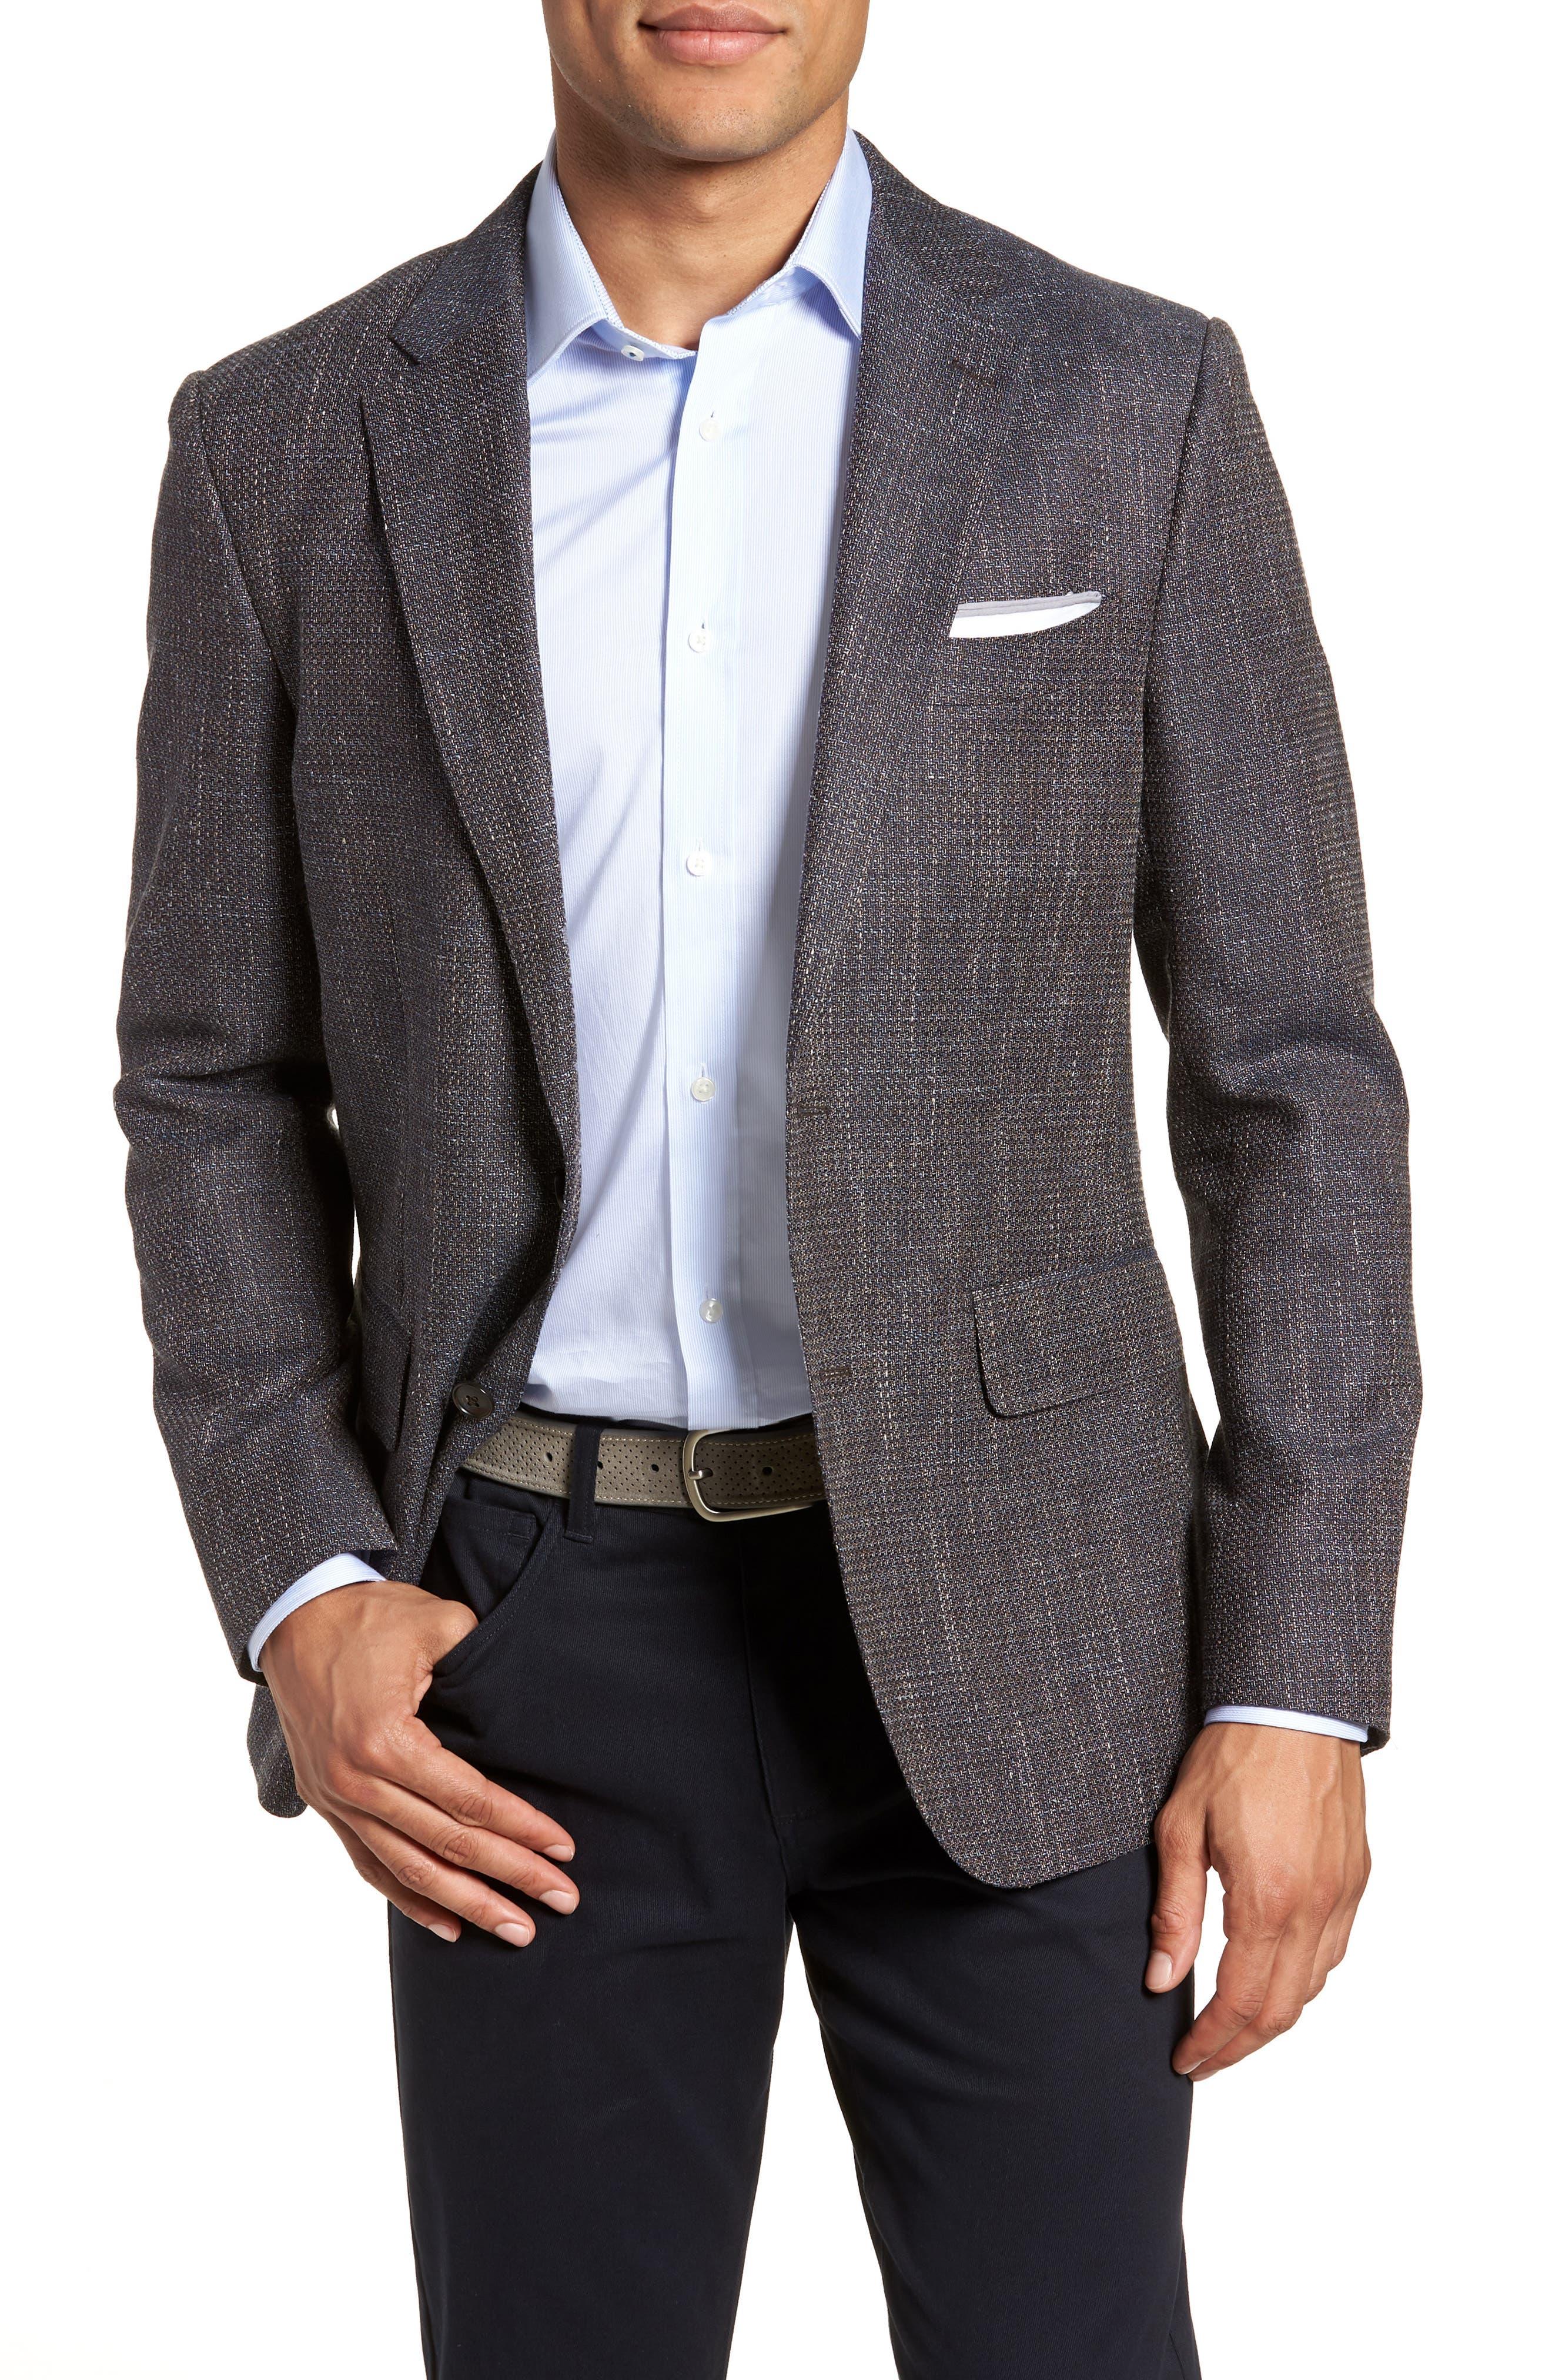 Five Bridges Slim Fit Tweed Sport Coat,                             Main thumbnail 1, color,                             Sepia